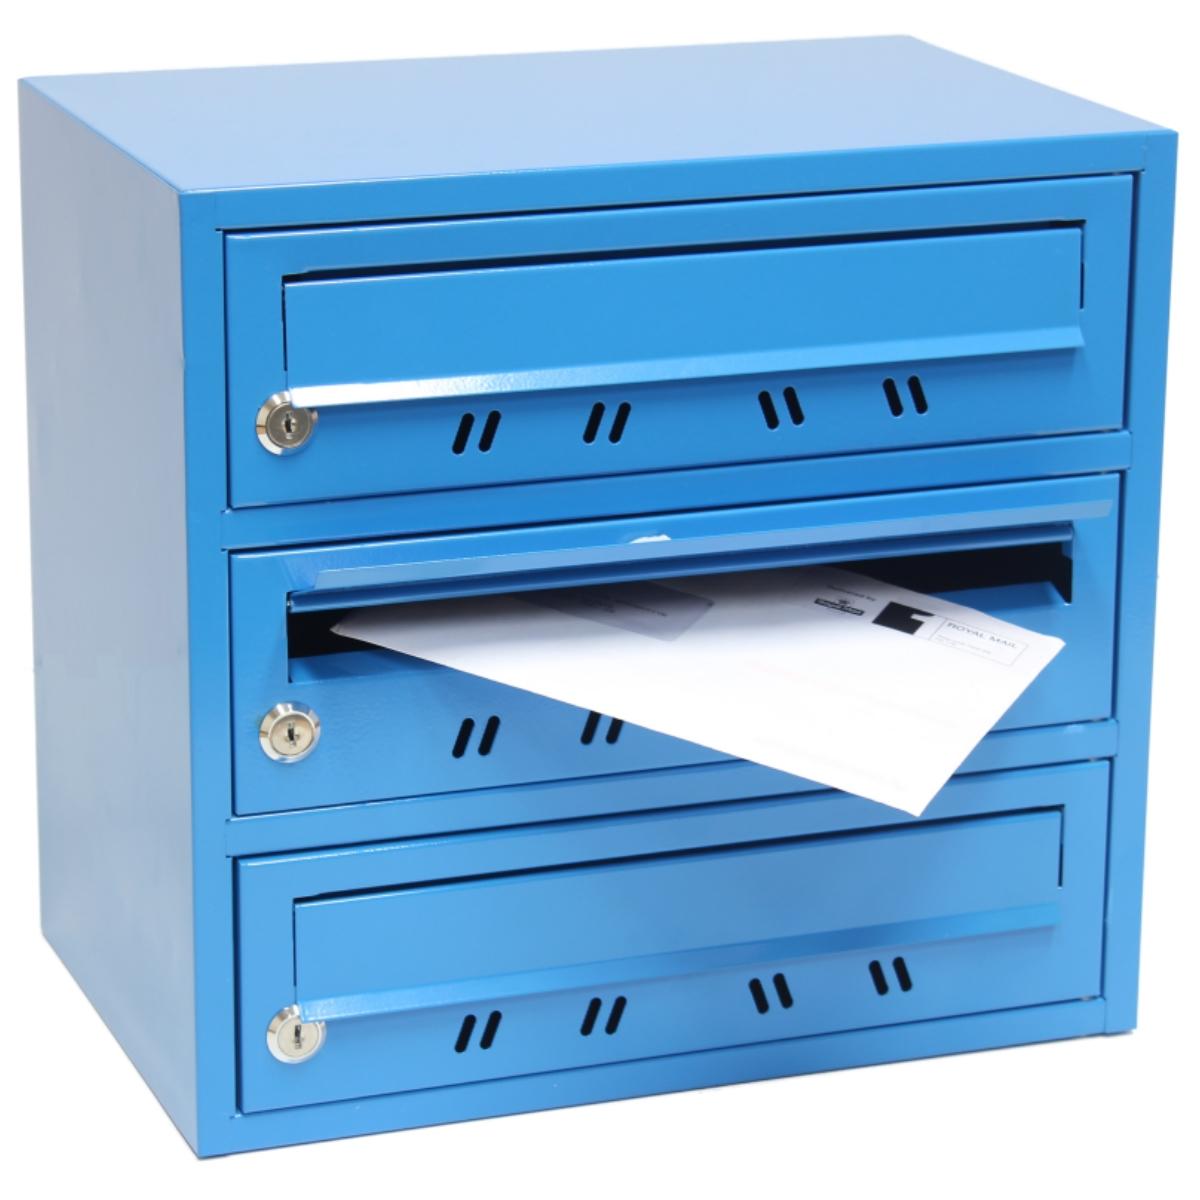 Letterbox slots